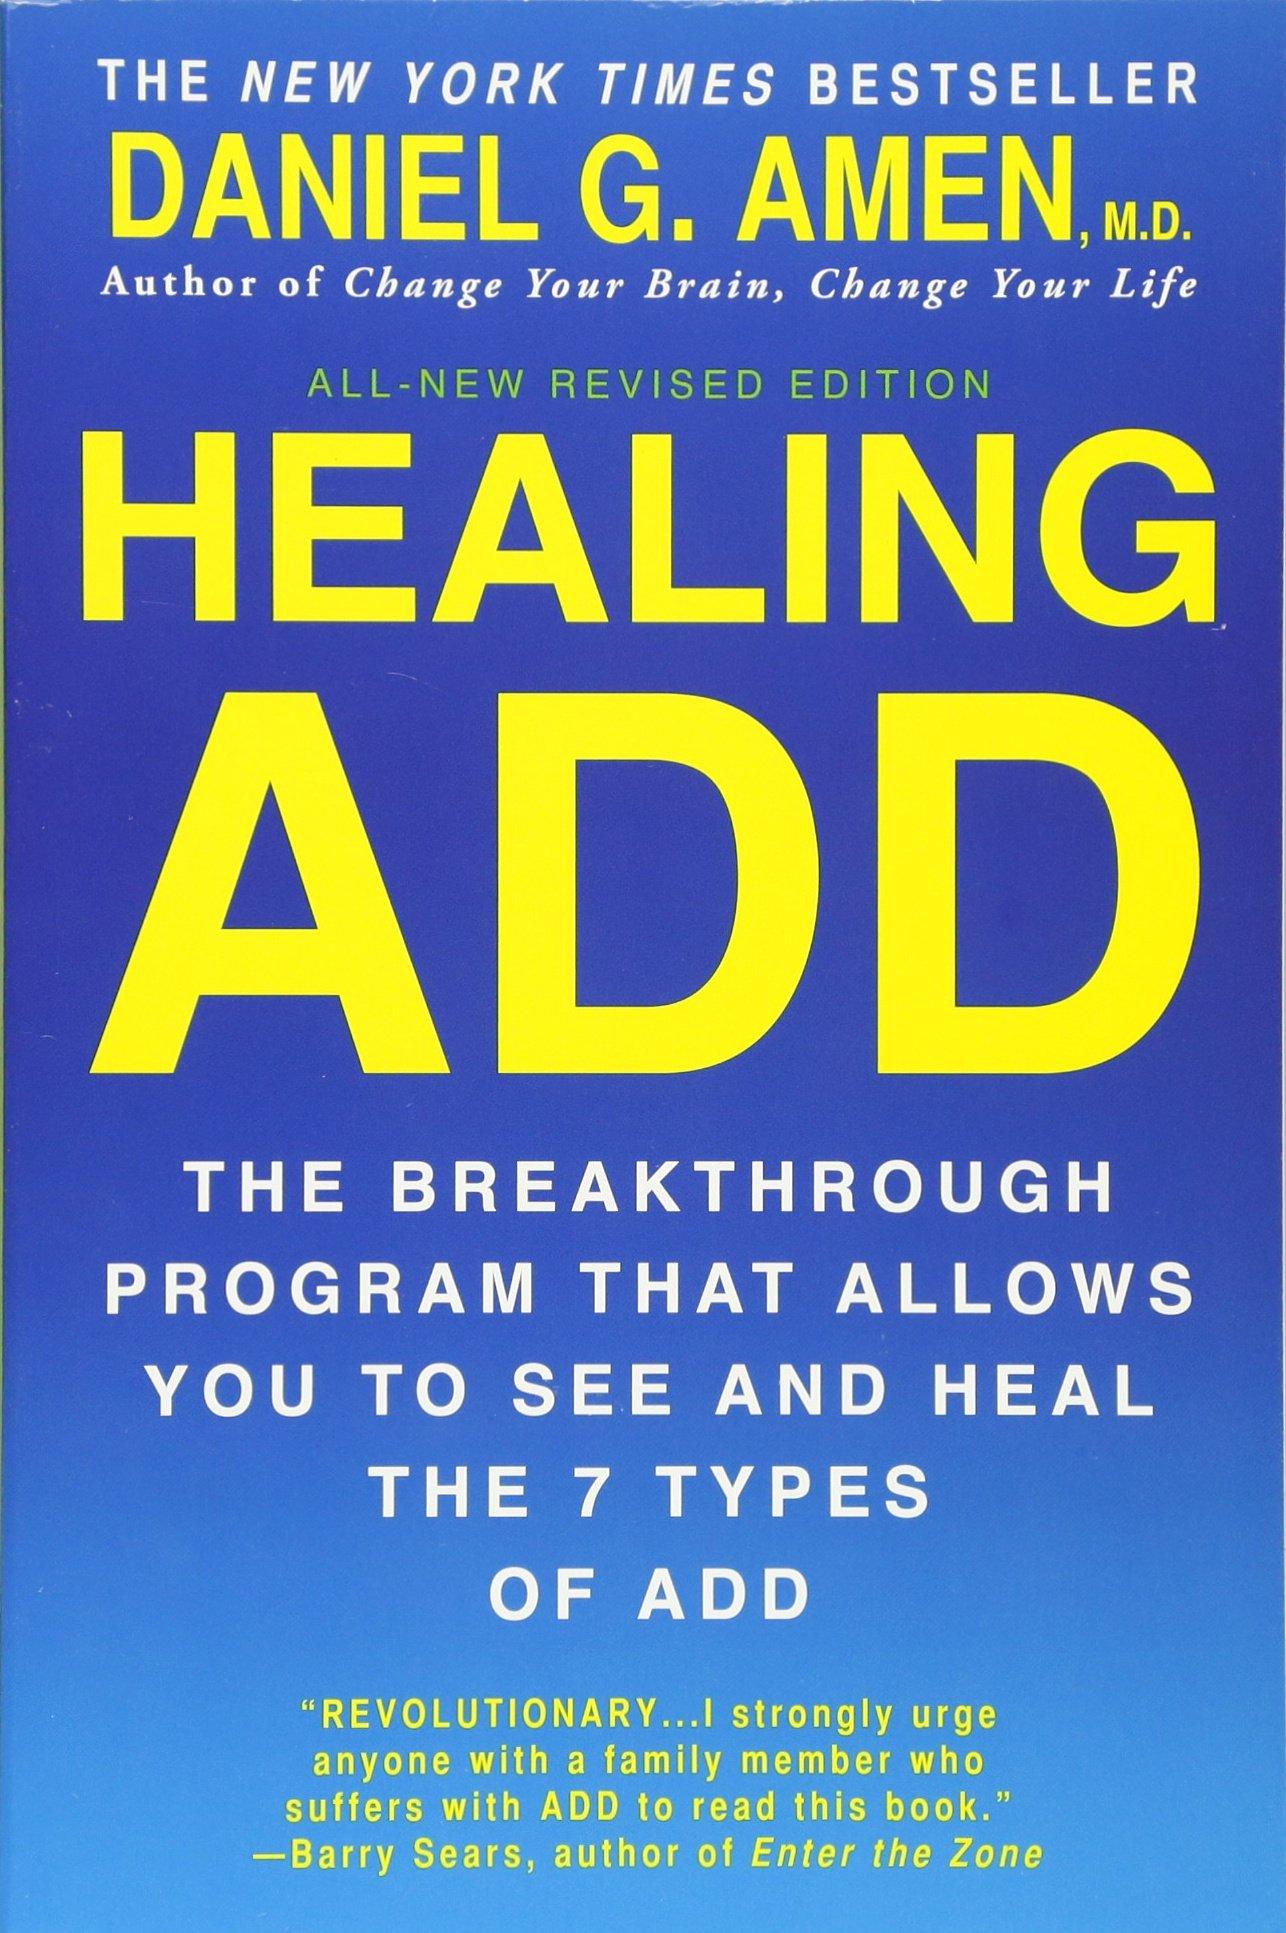 Healing ADD Revised Breakthrough Program product image